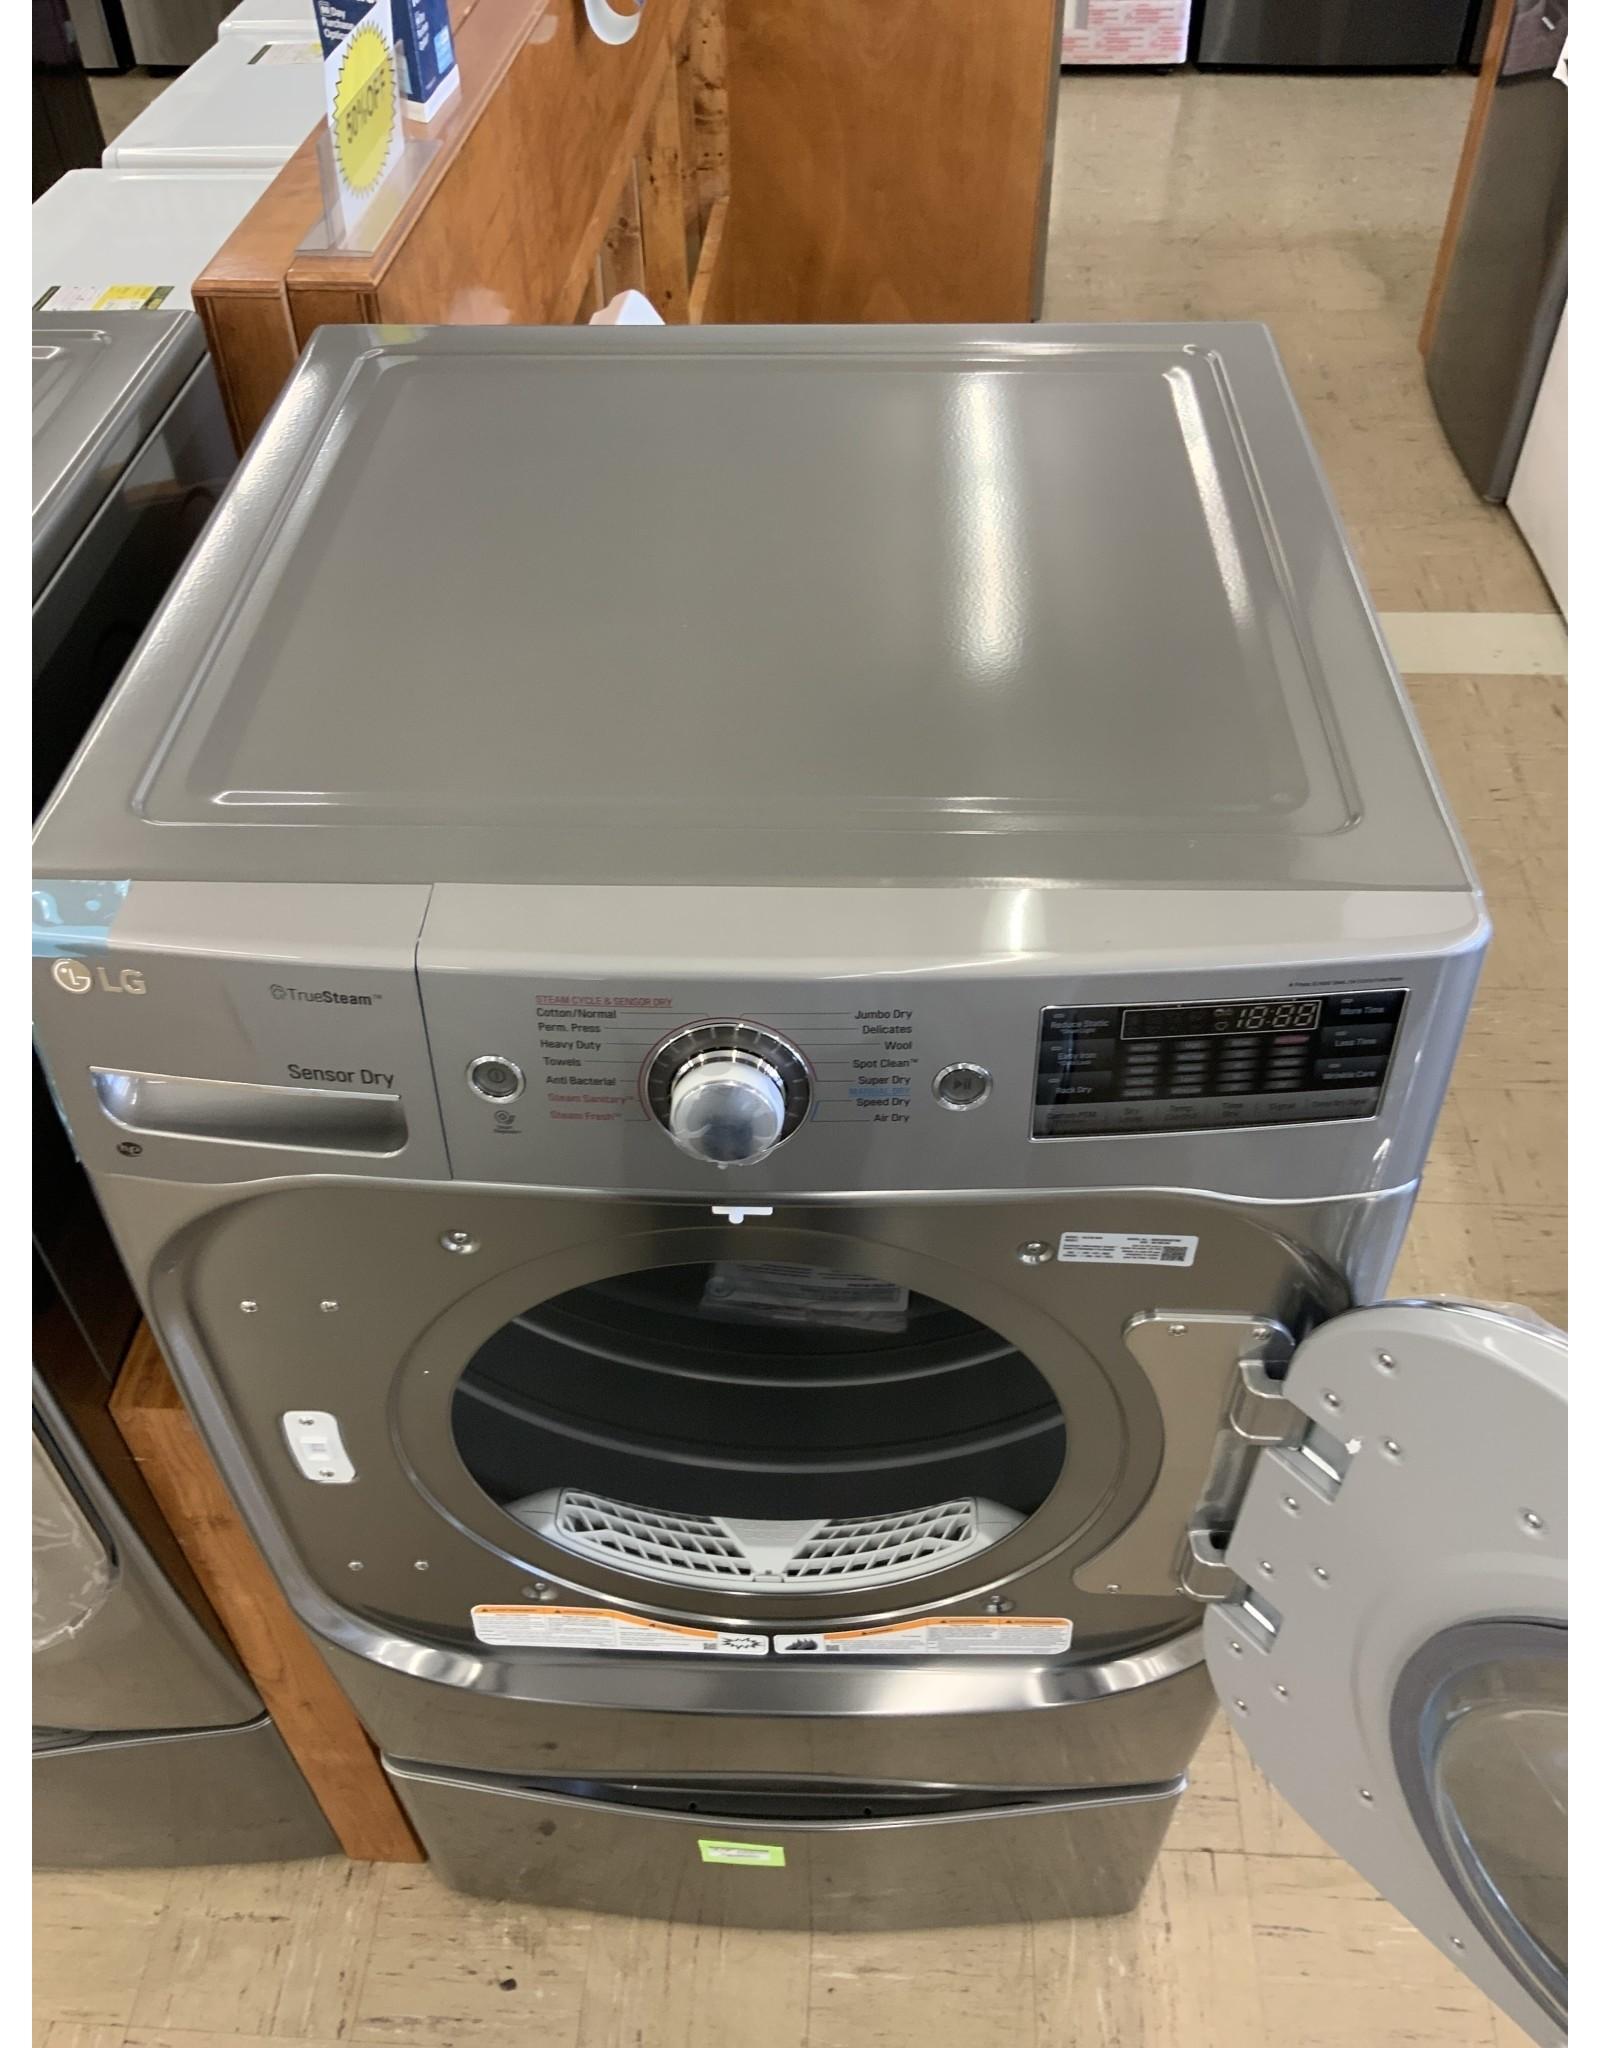 LG Electronics DLEX8100V 9.0 cu. ft. Stackable Front Load Electric Dryer w/ TrueSteam, SteamFresh & Pedestal Compatible in Graphite Steel